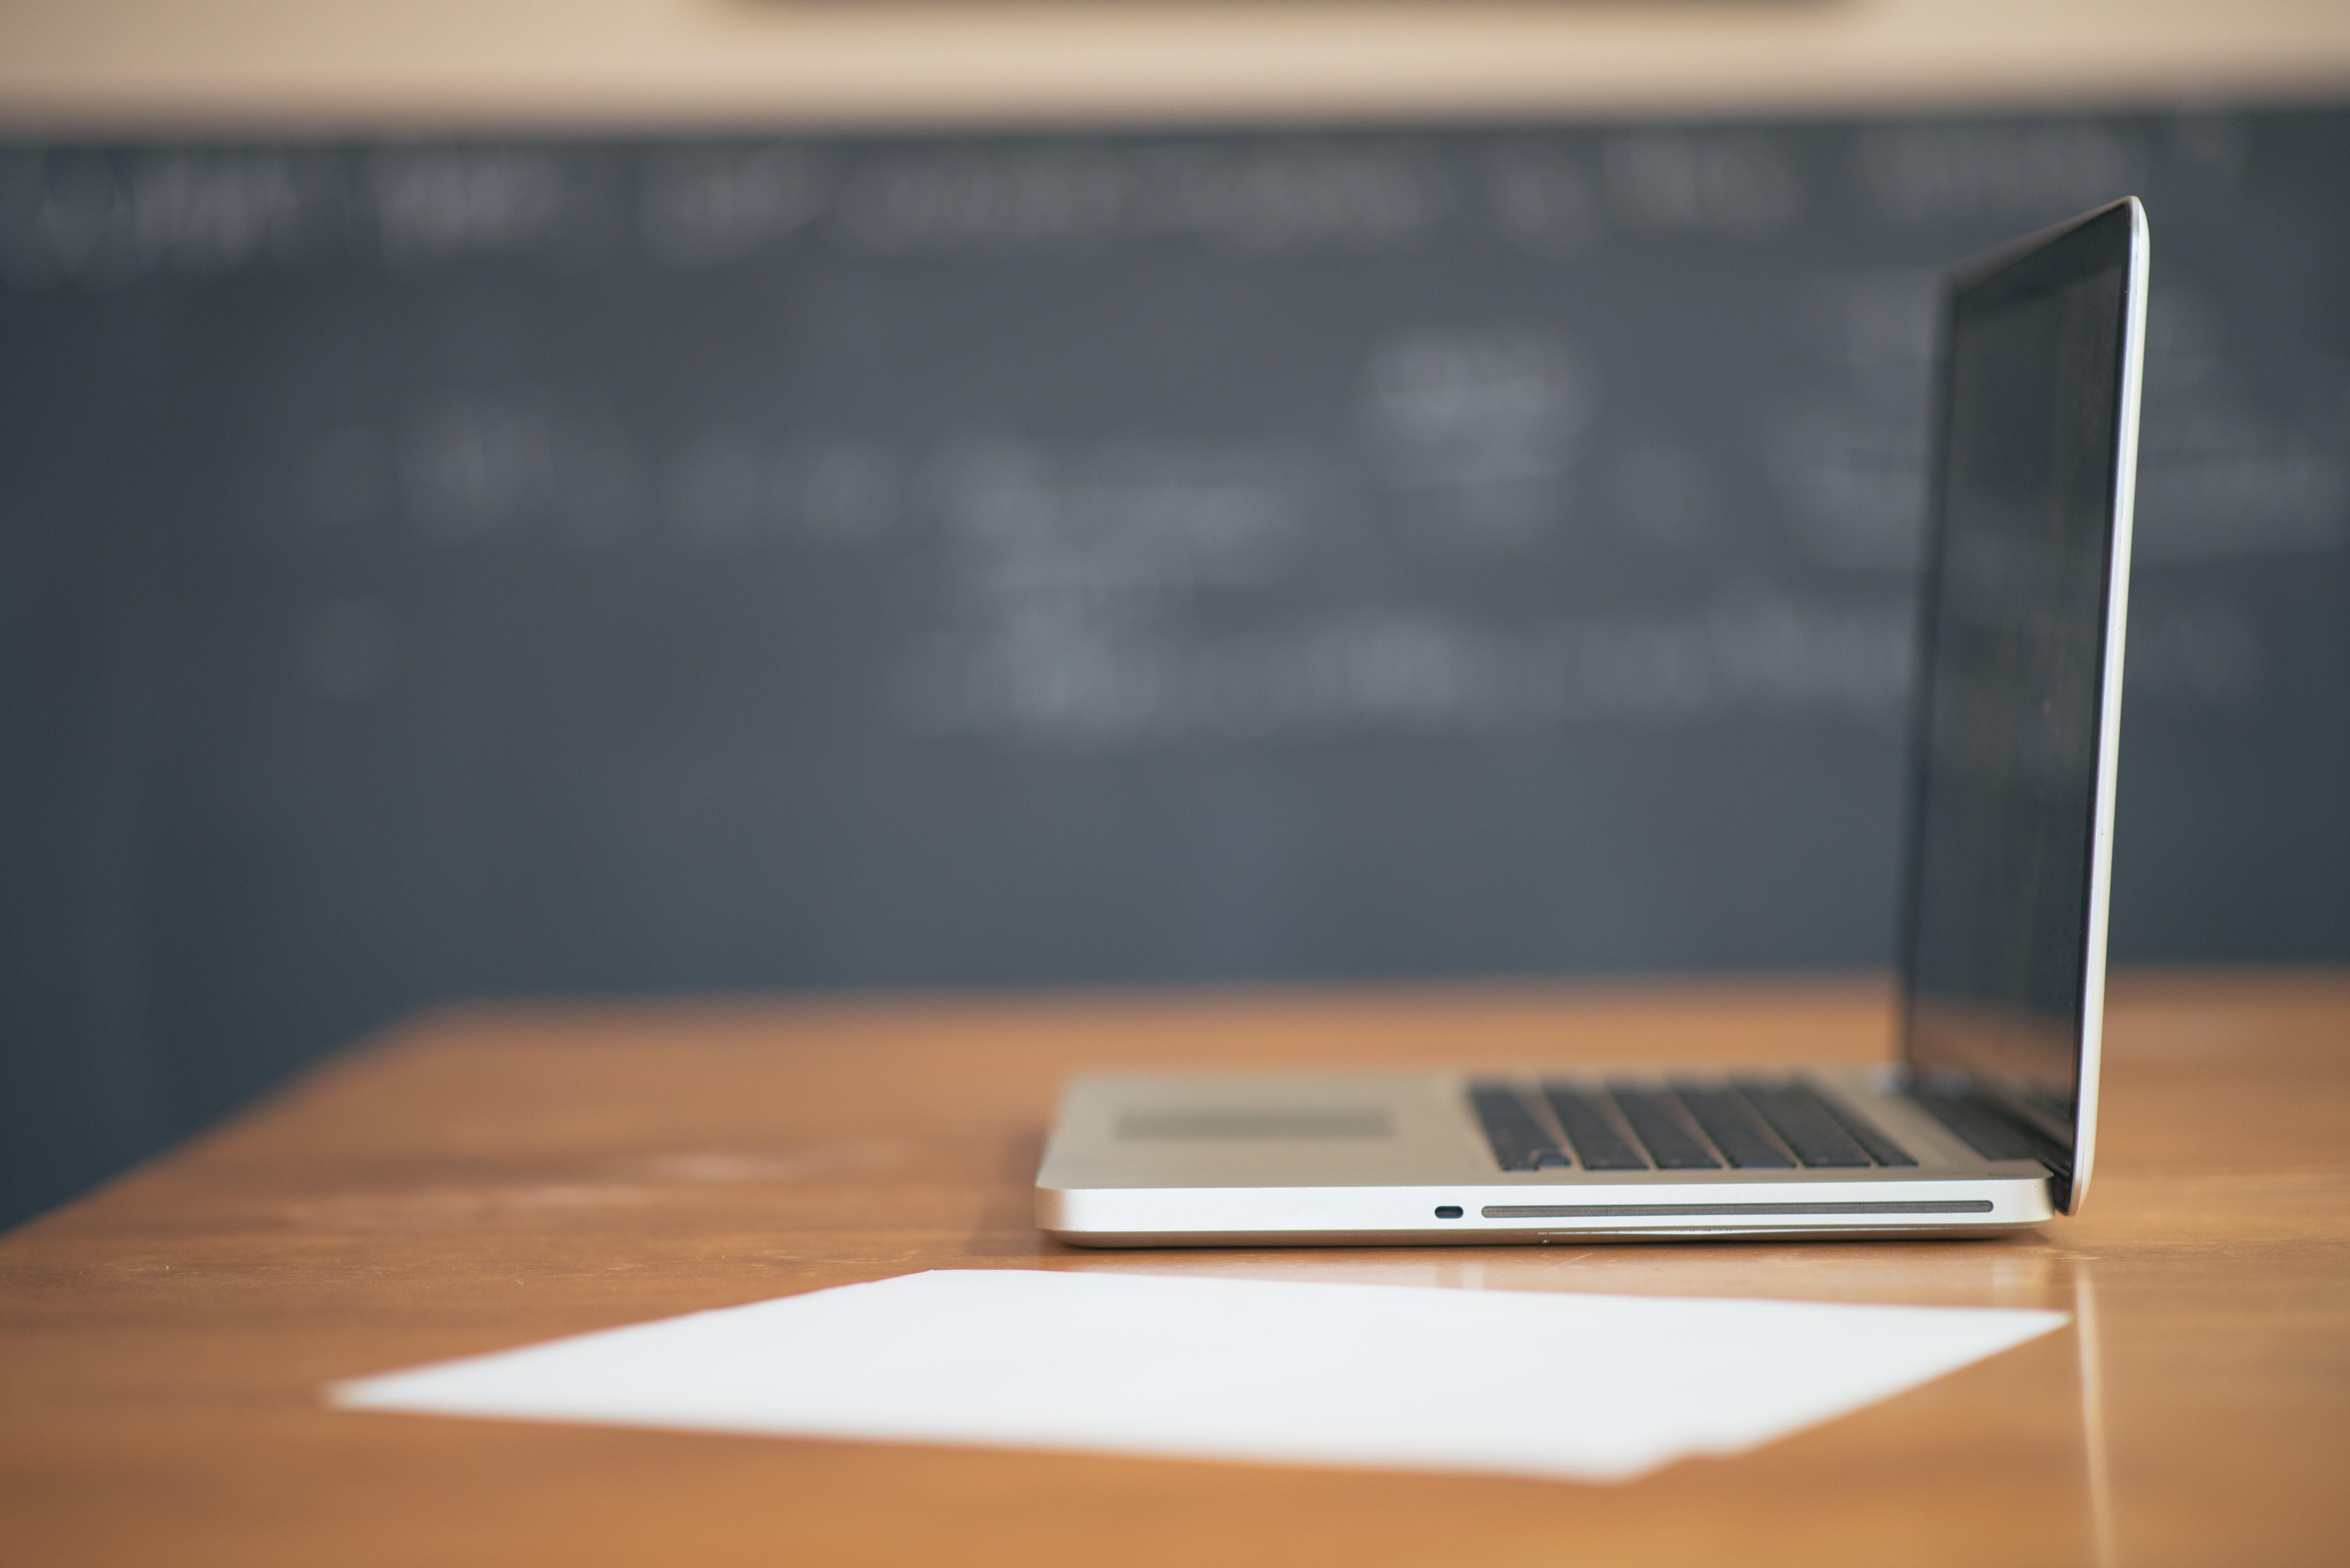 apple-desk-laptop-6565